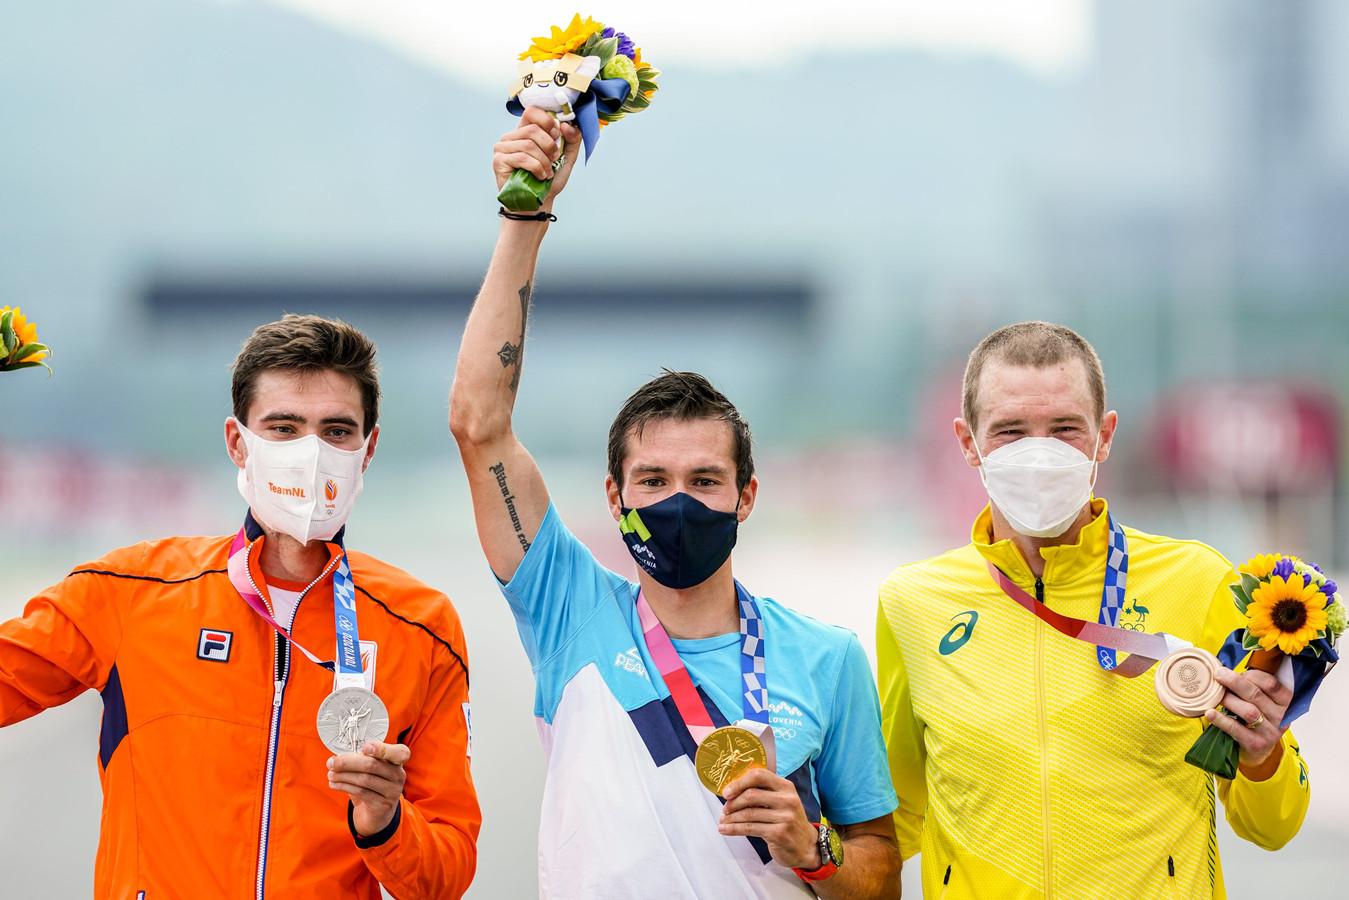 Tom Dumoulin, Primoz Roglic et Rohan Dennis